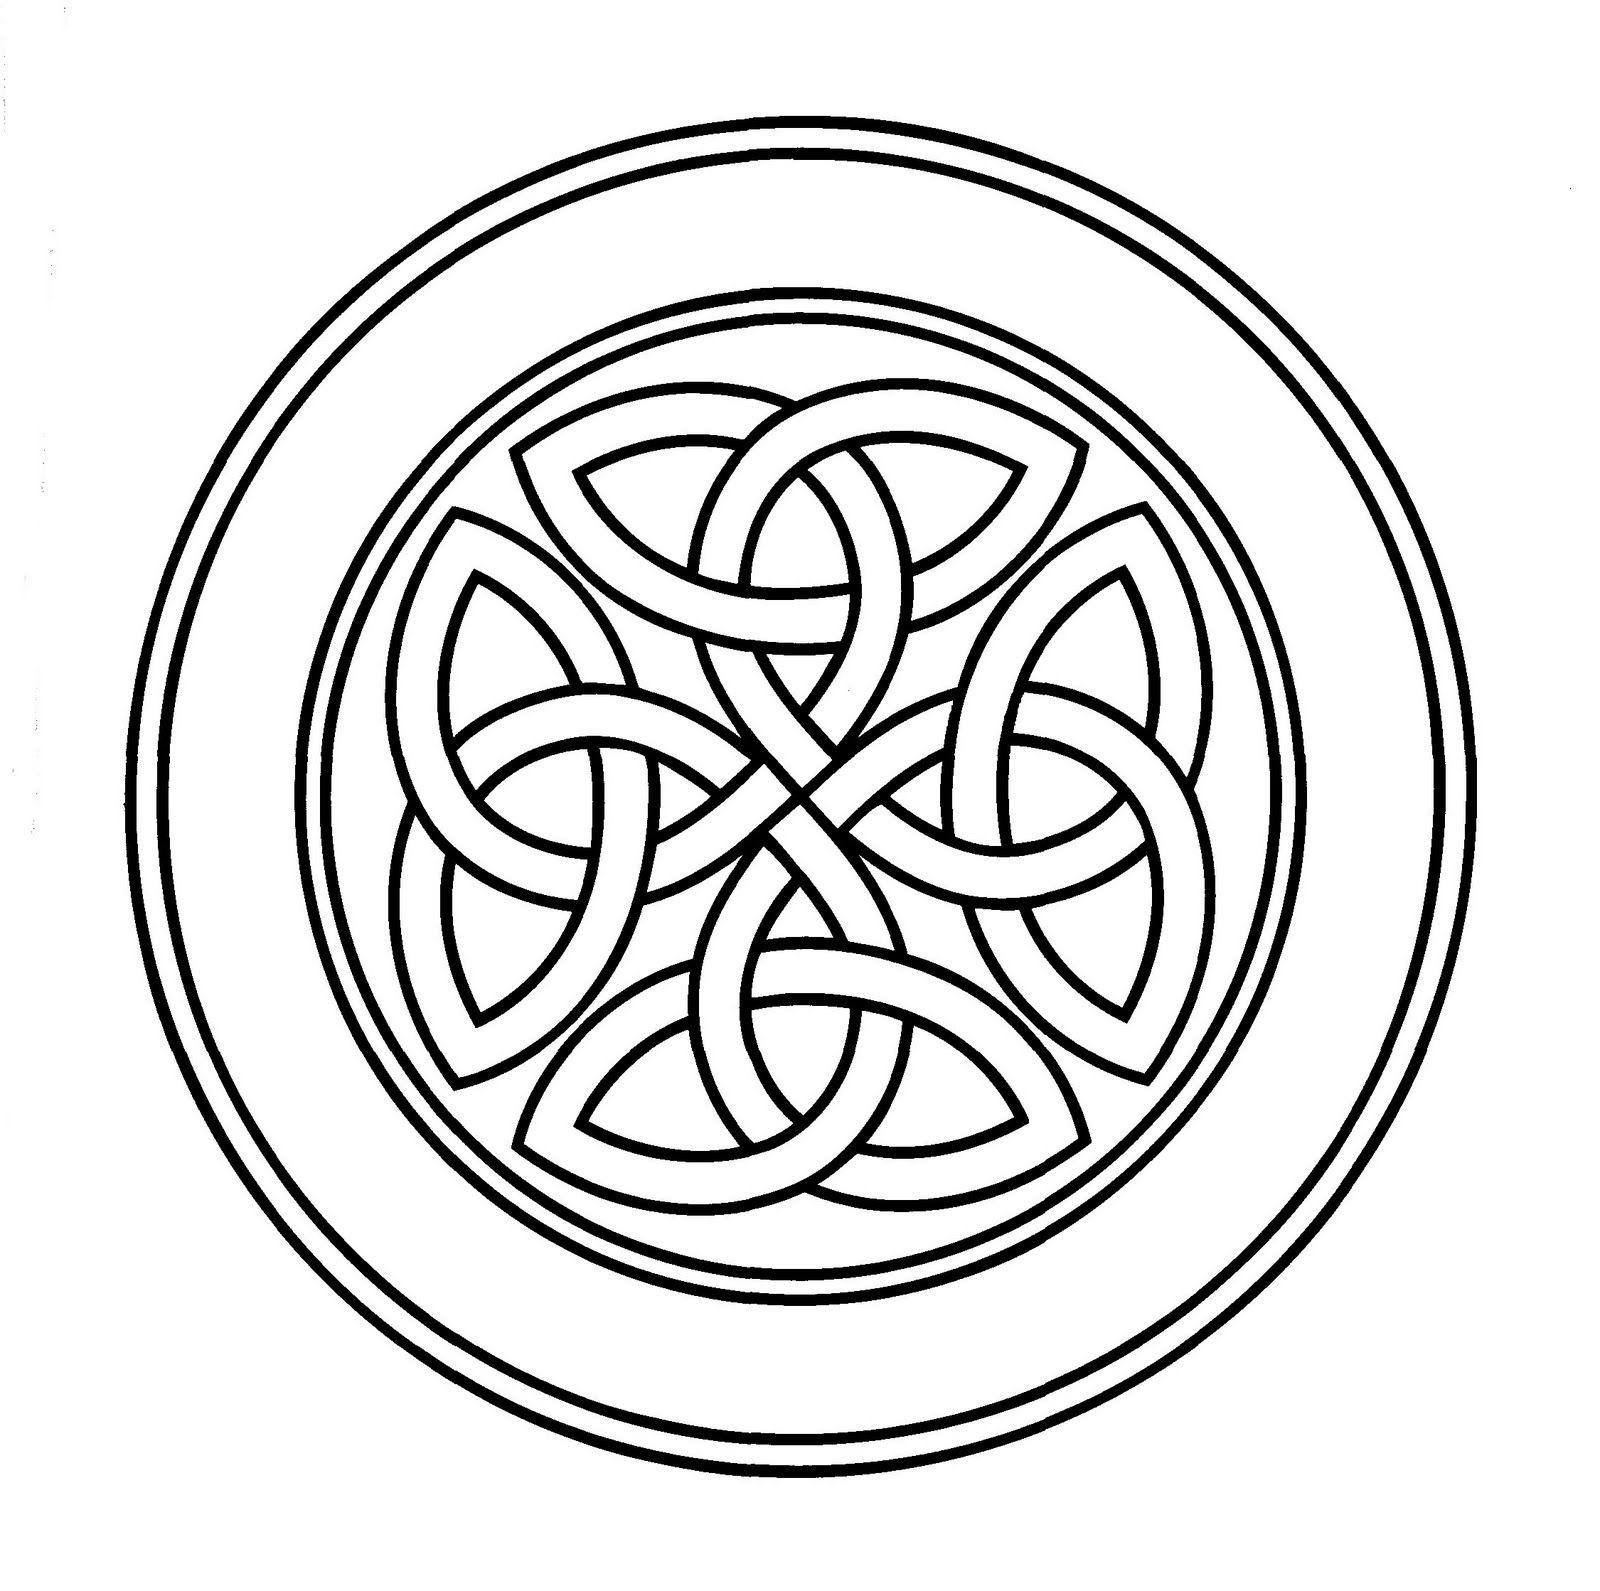 Celta redondo | celtas dibujos | Pinterest | Celta, Dibujo y Mandalas